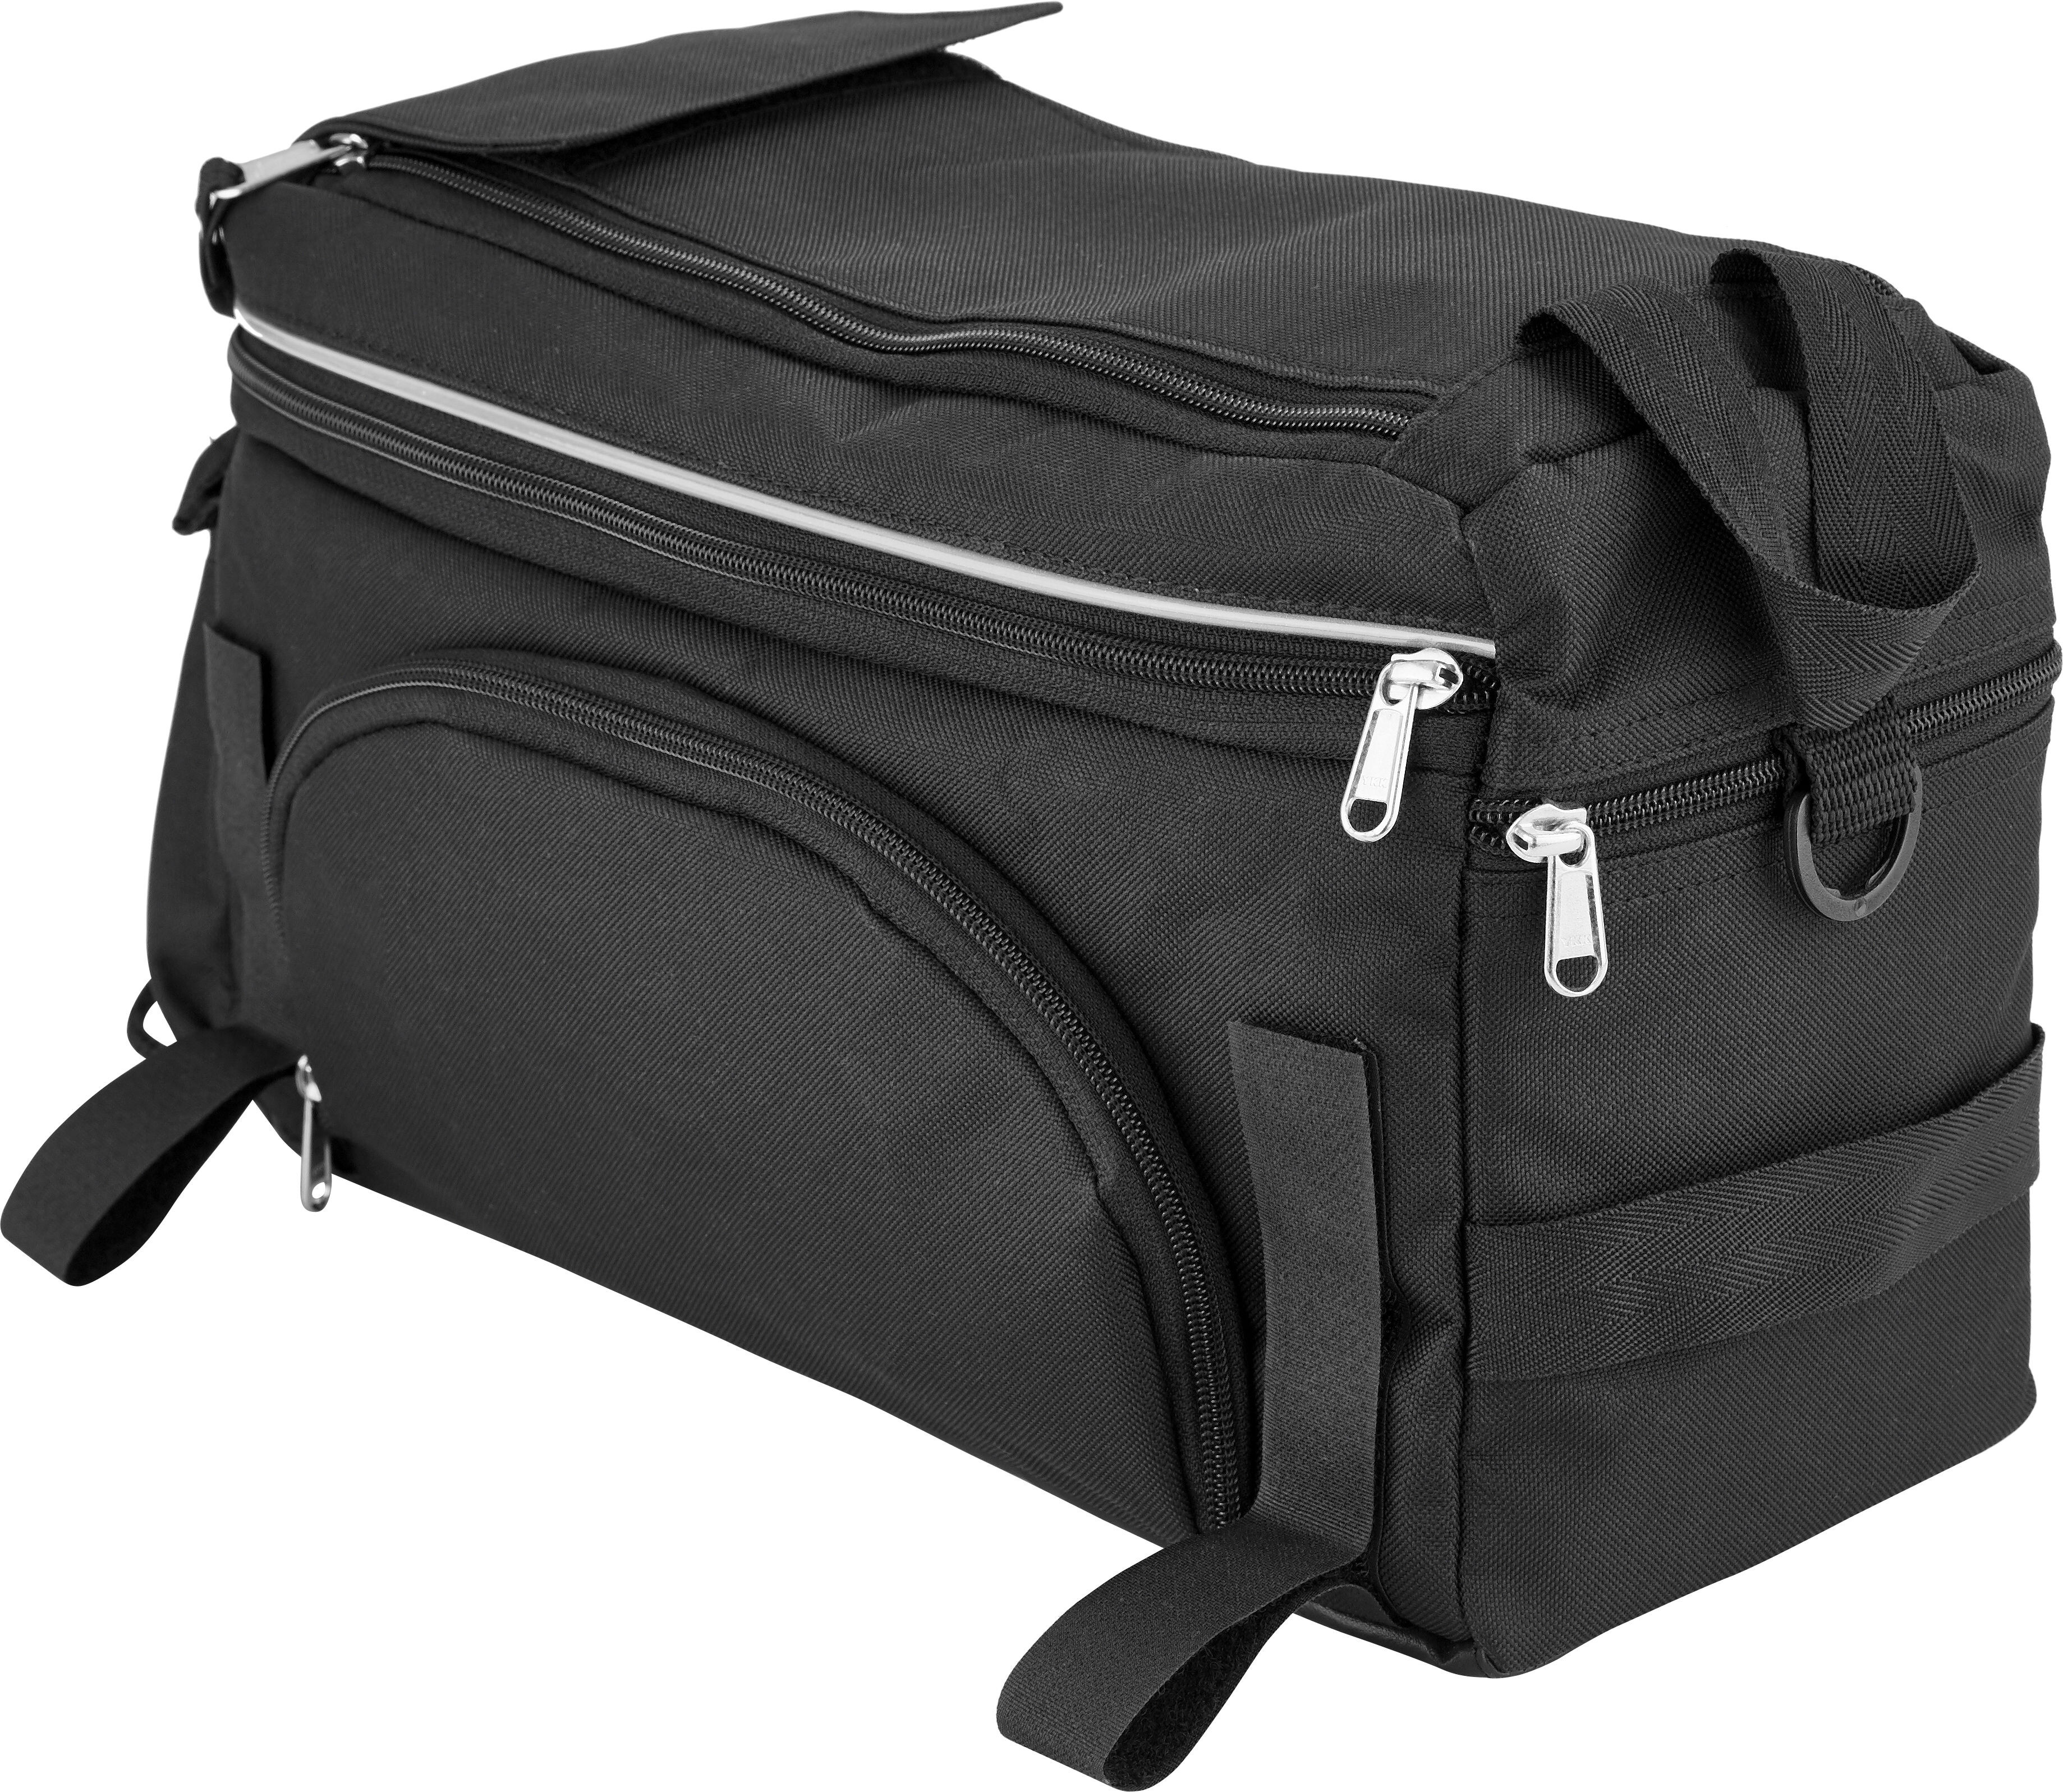 red cycling products rack pack gep cktr gertasche schwarz. Black Bedroom Furniture Sets. Home Design Ideas